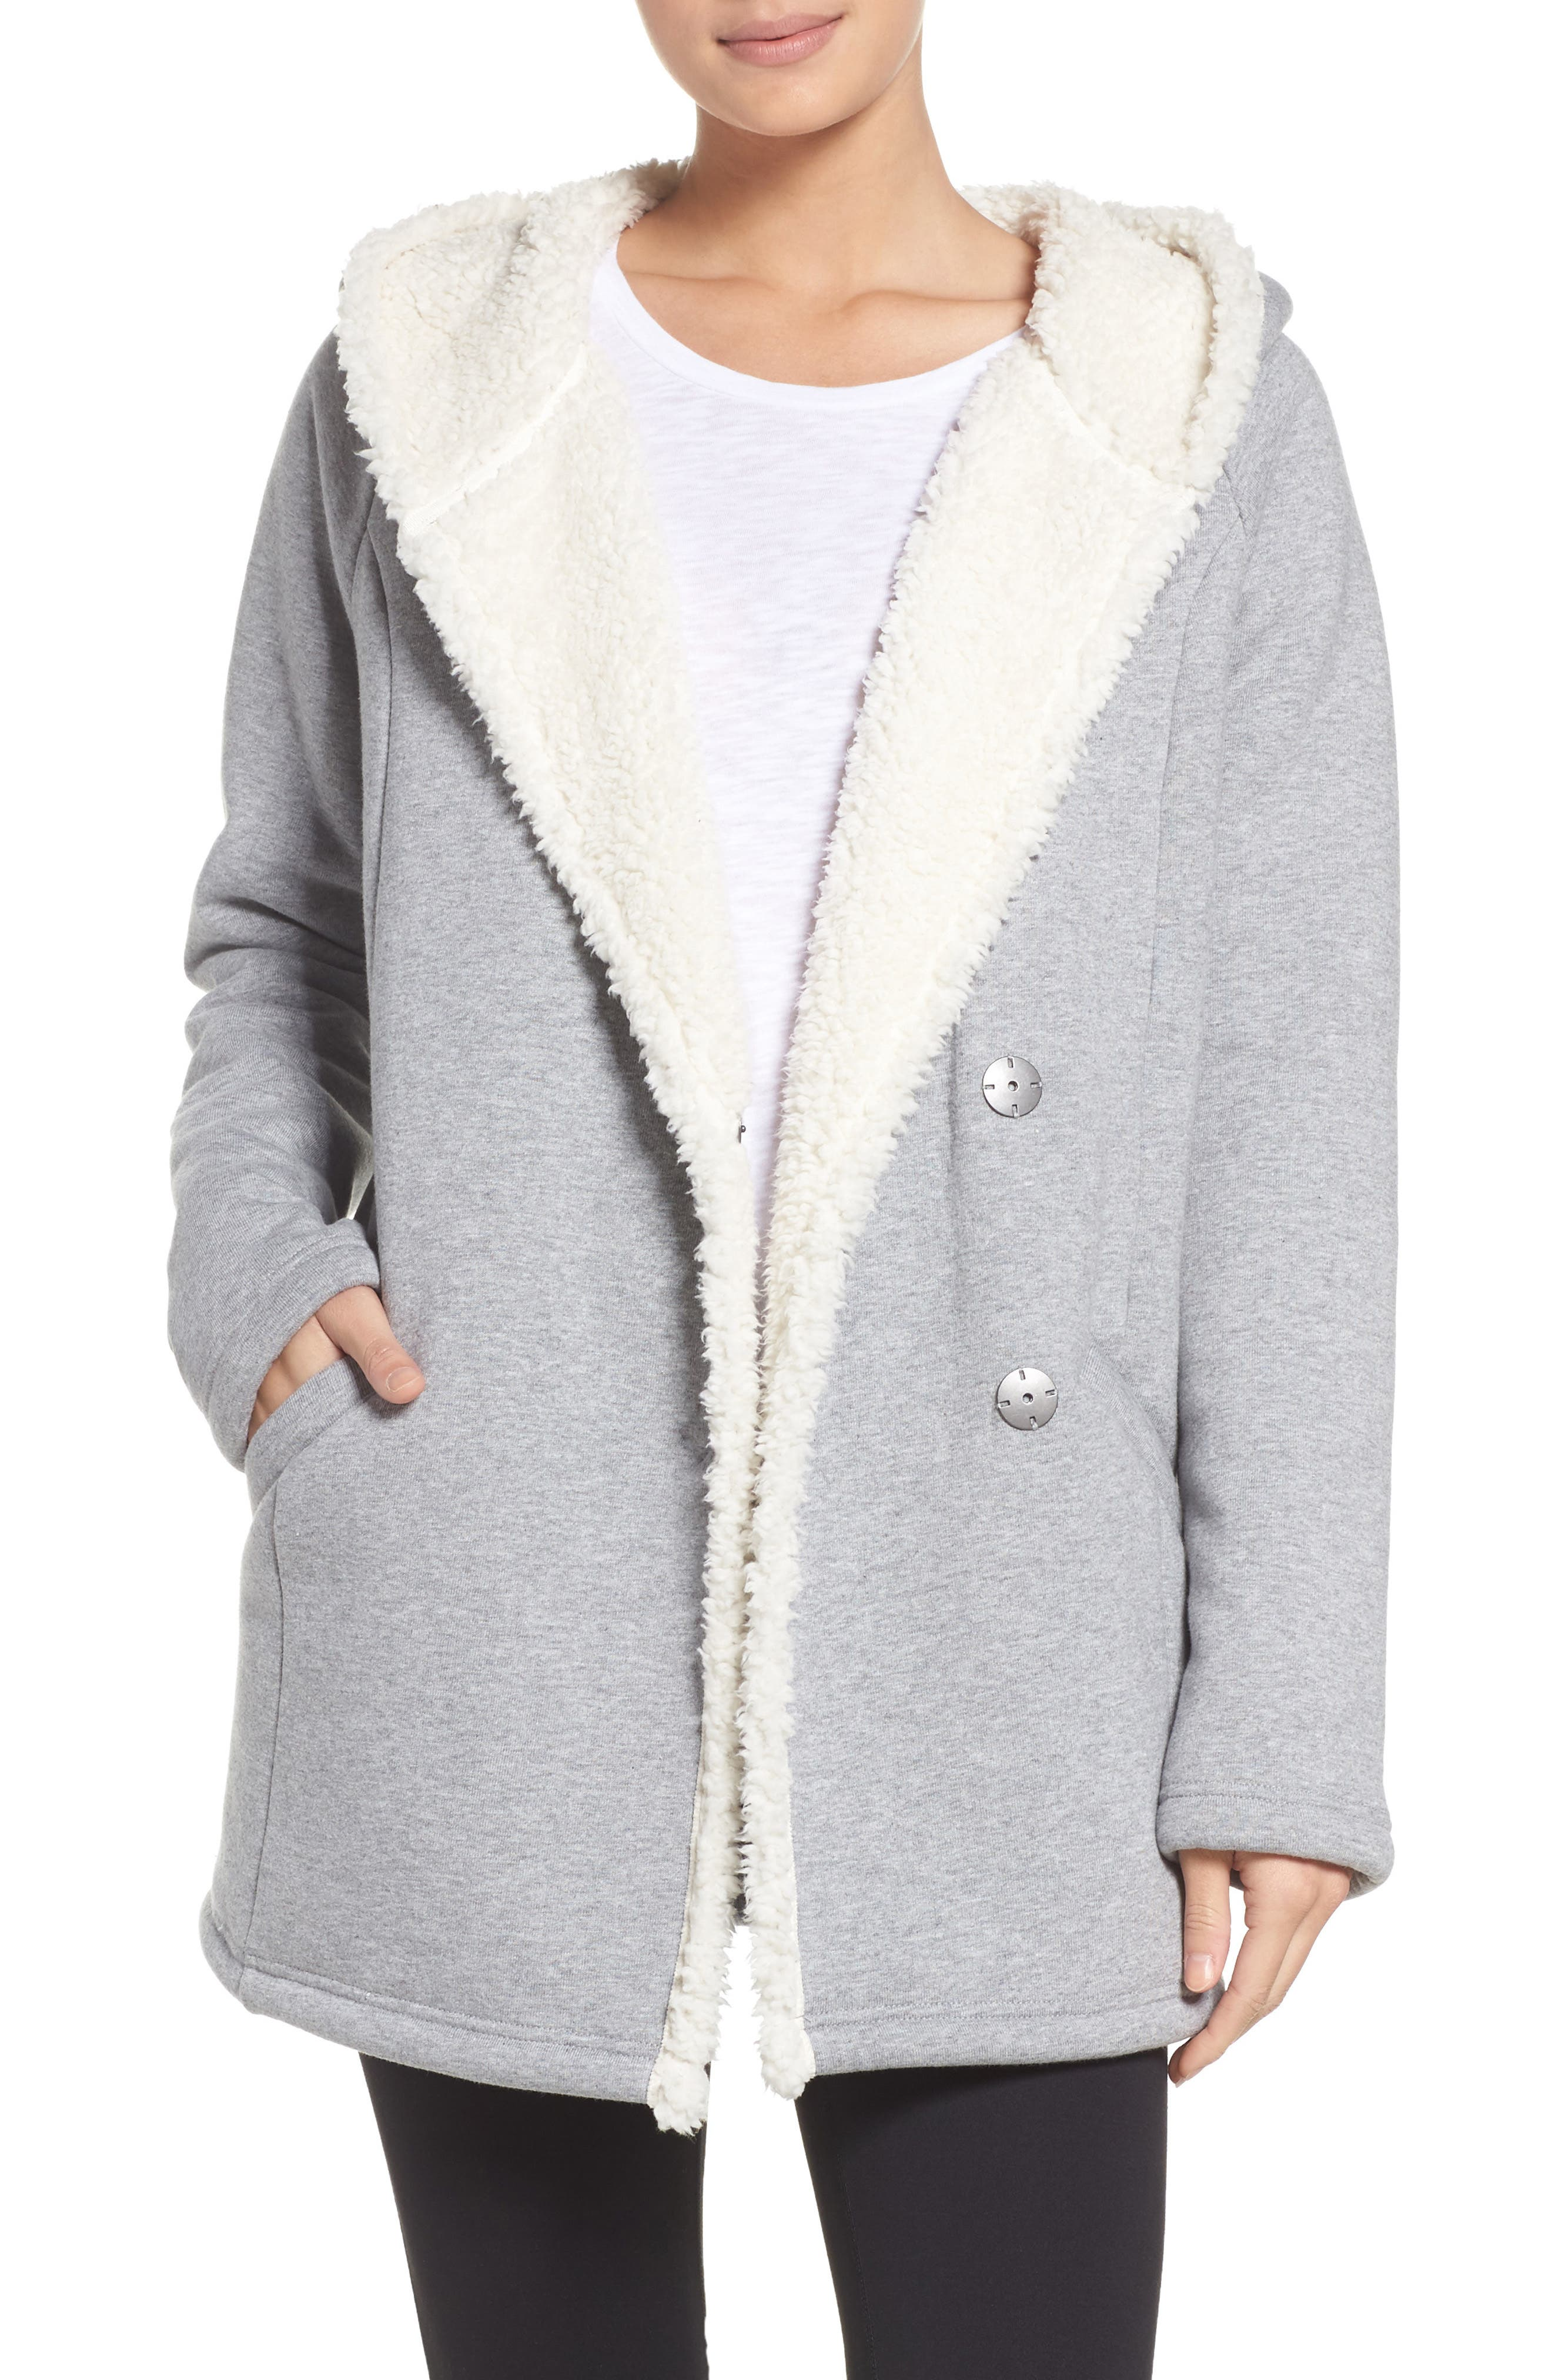 Chalet Fleece Lined Hooded Wrap,                             Main thumbnail 1, color,                             030